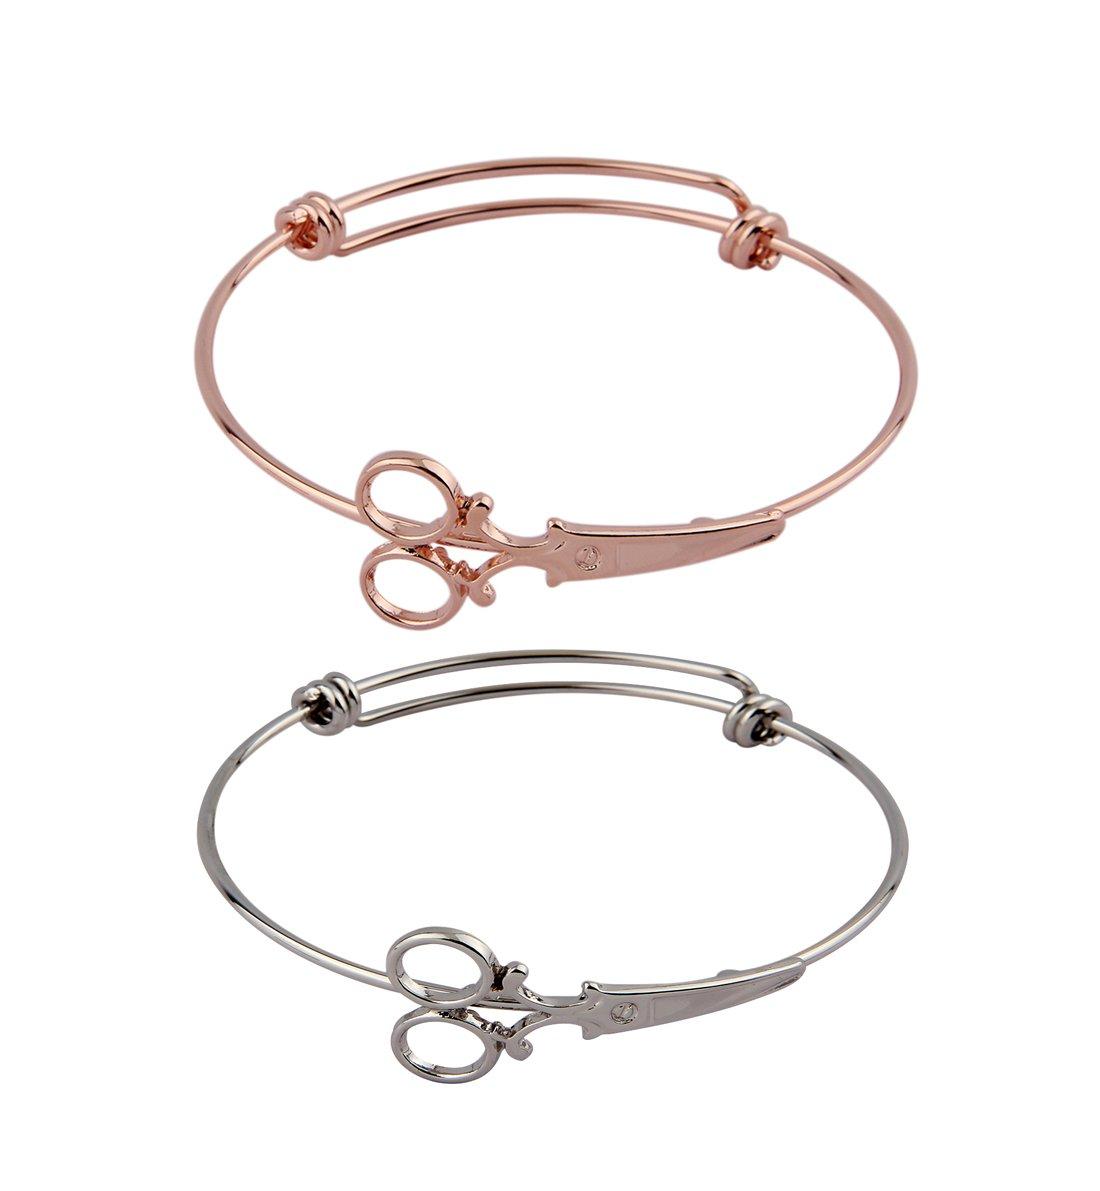 Zuo Bao Steampunk Shears Scissor Bangle Bracelet for Hairdresser 3